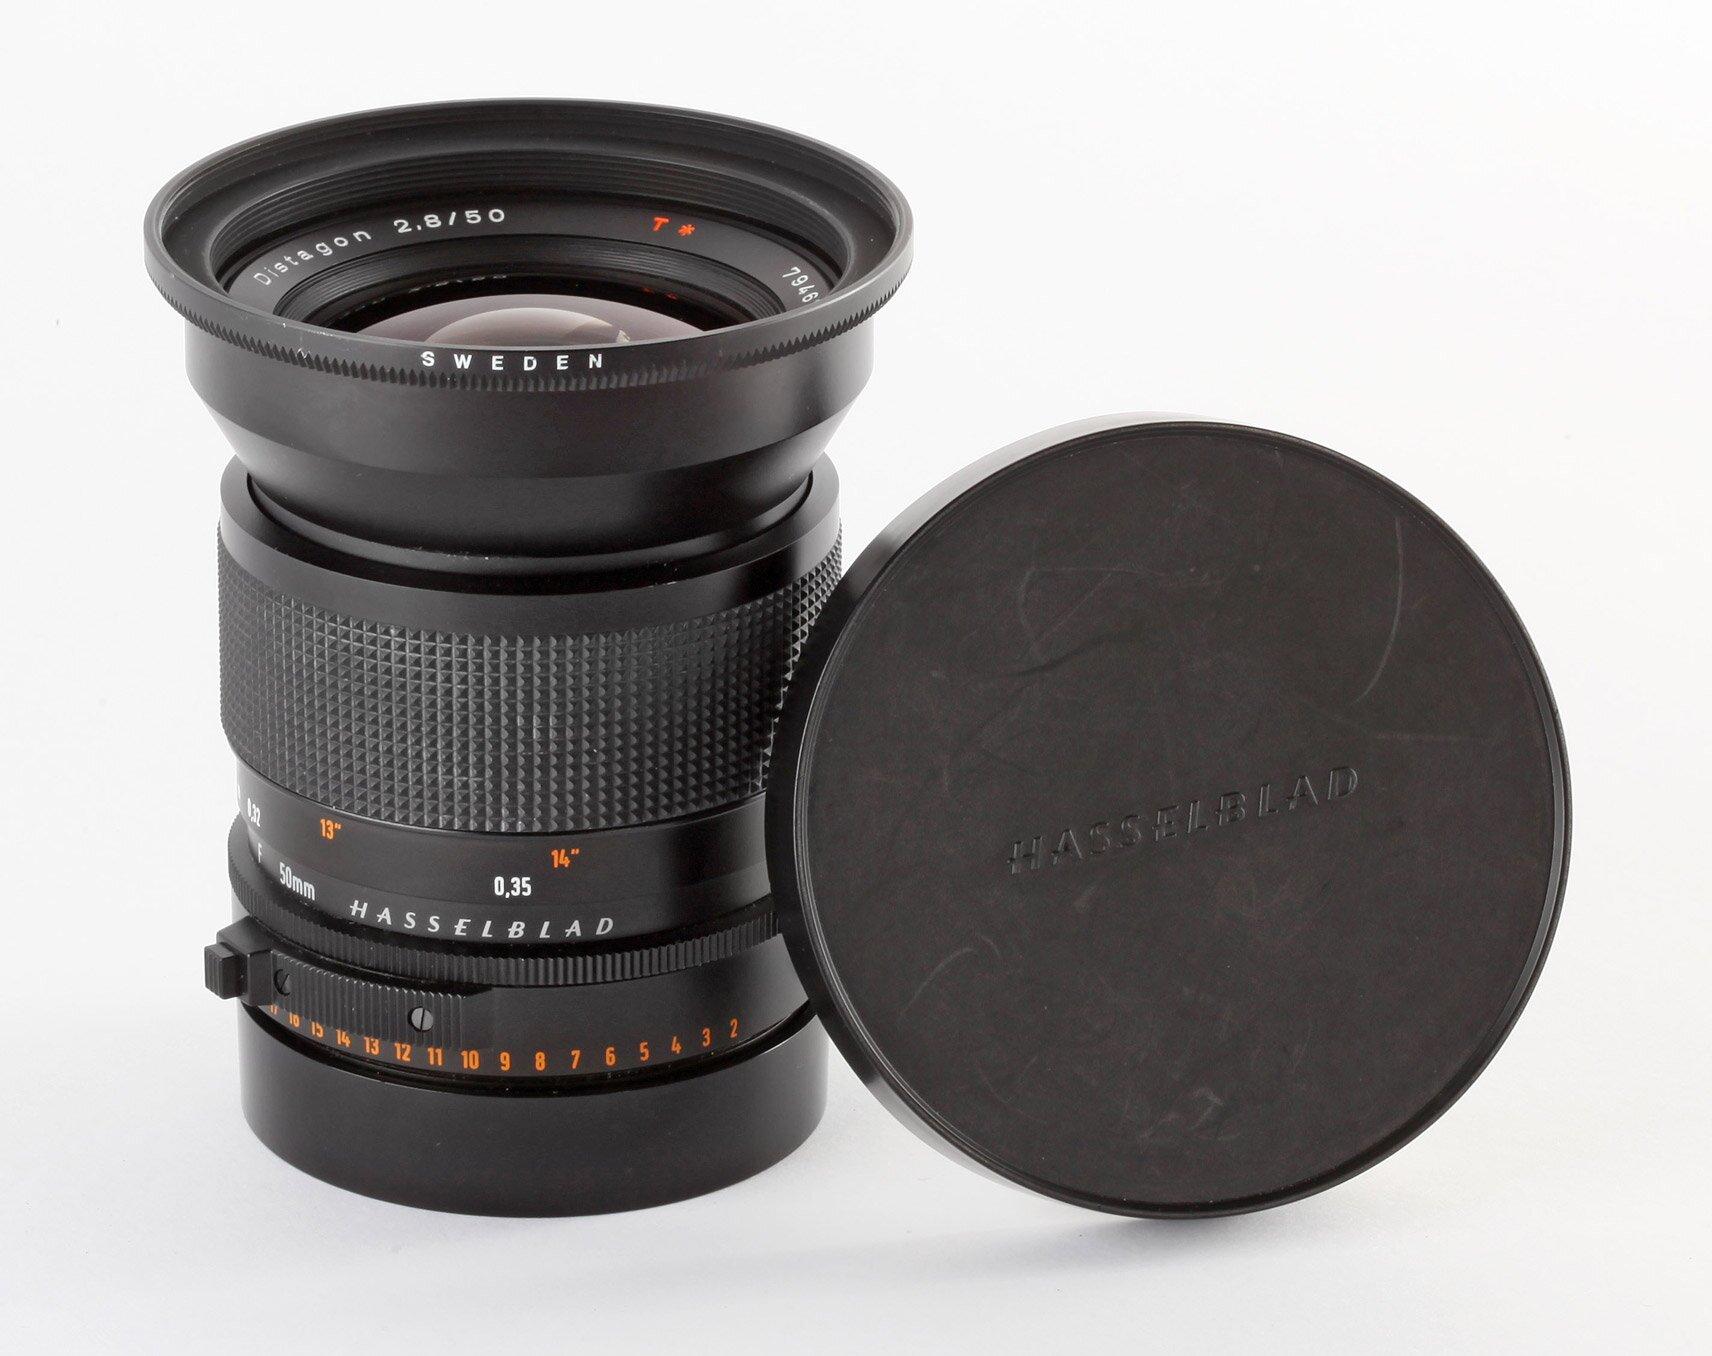 Carl Zeiss Hasselblad Distagon 2,8/50mm T*